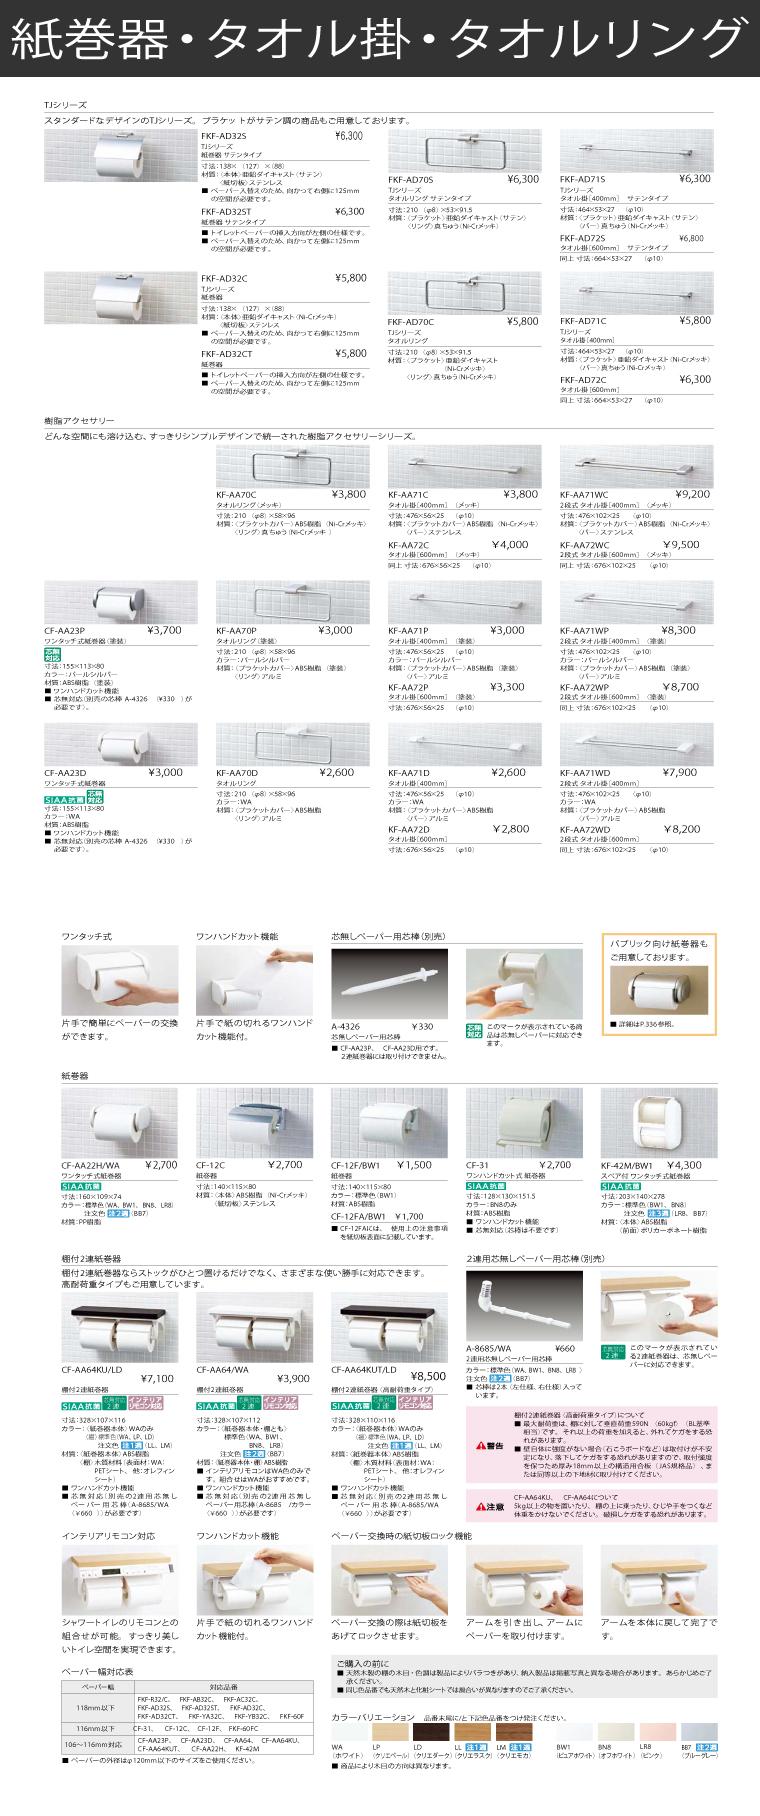 INAX トイレアクセサリー詳細画像